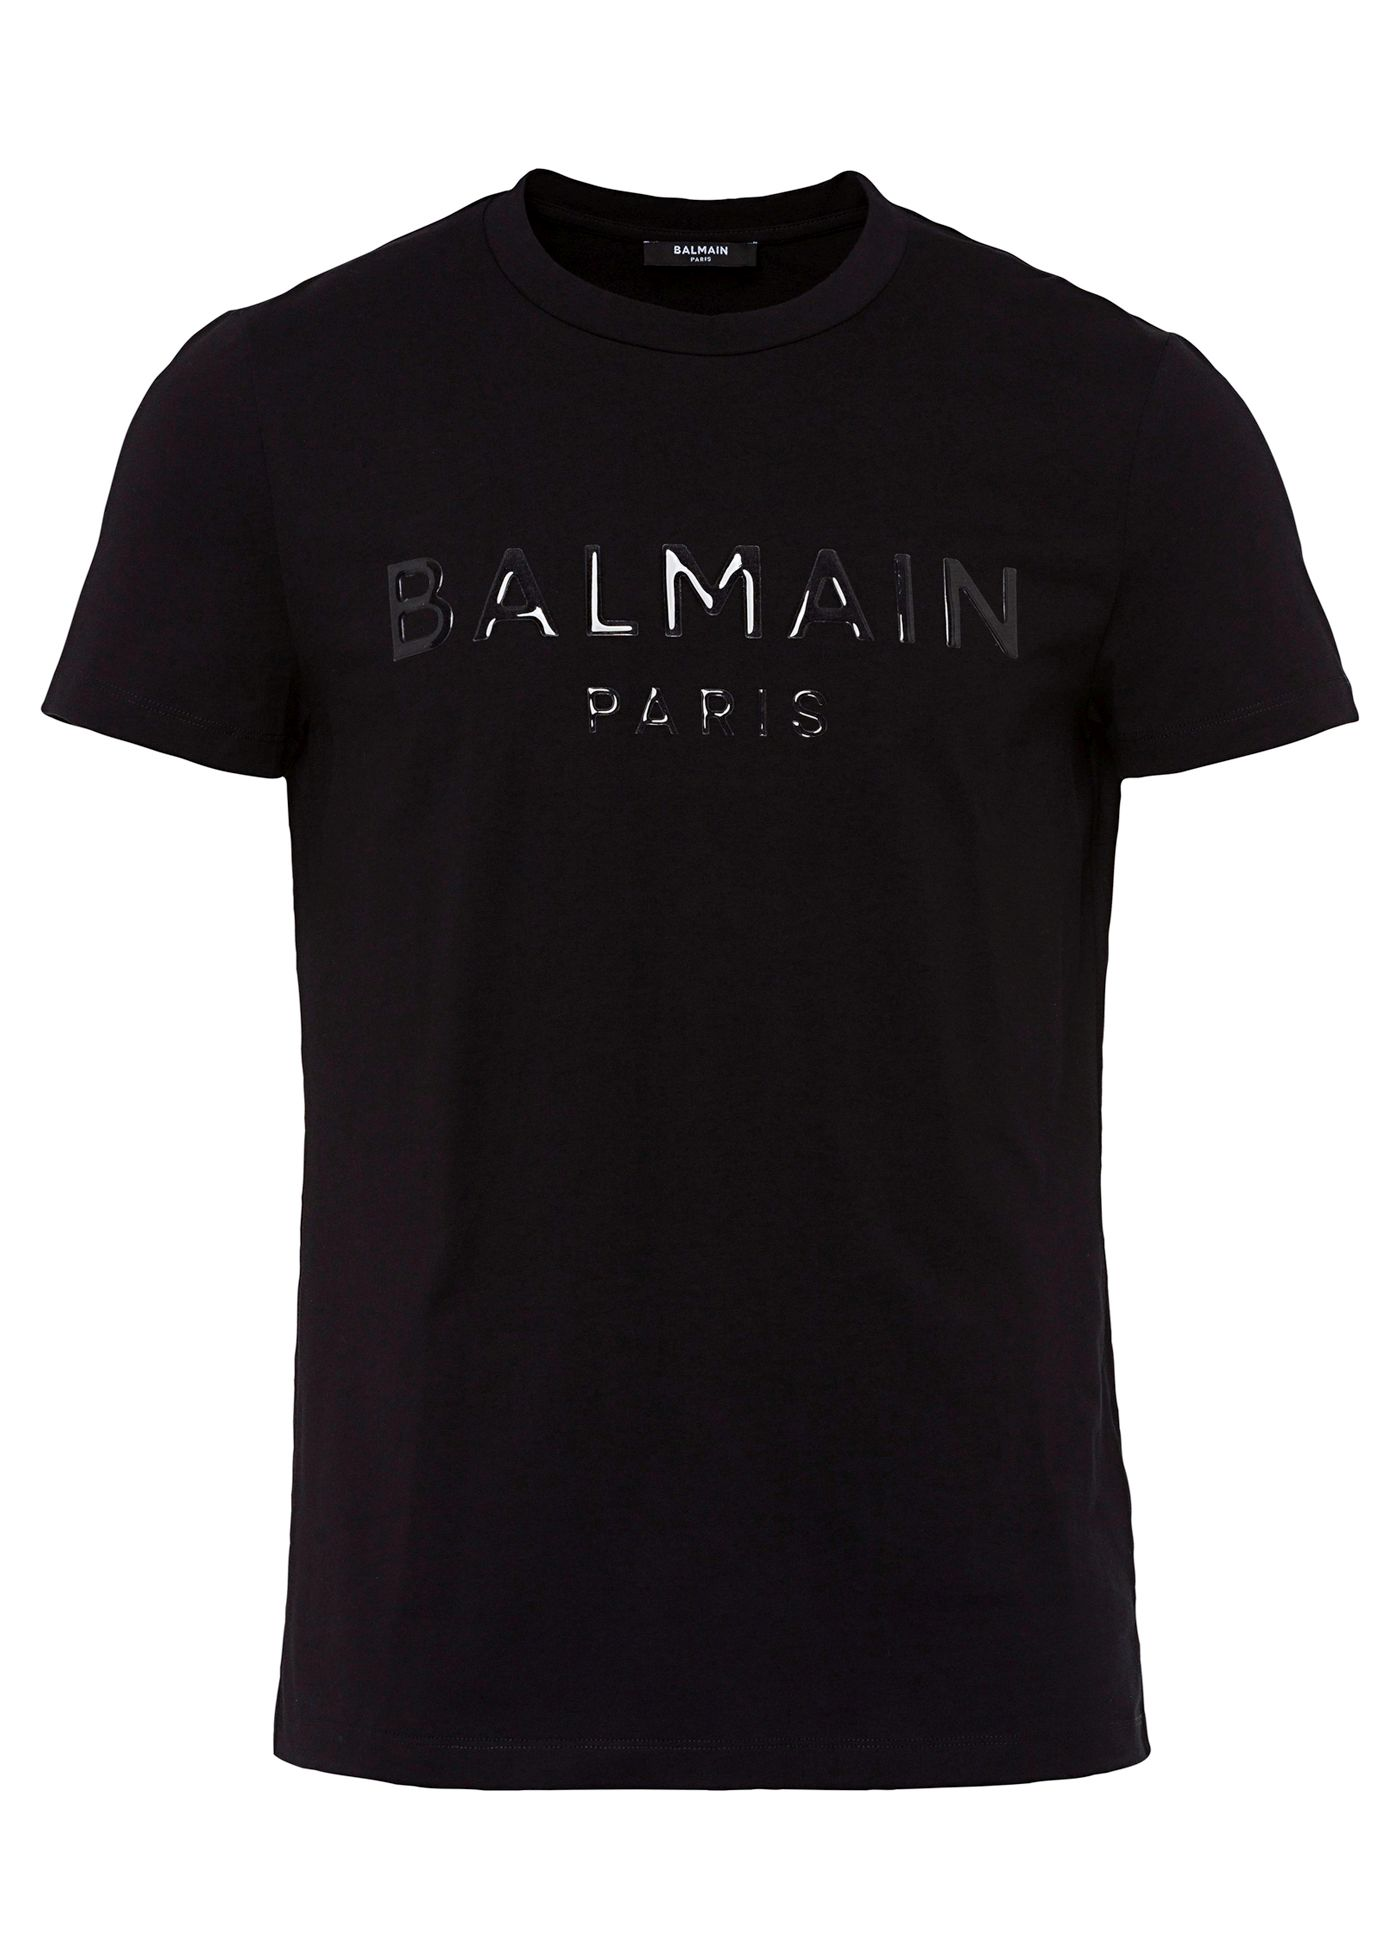 BALMAIN RESIN TS image number 0